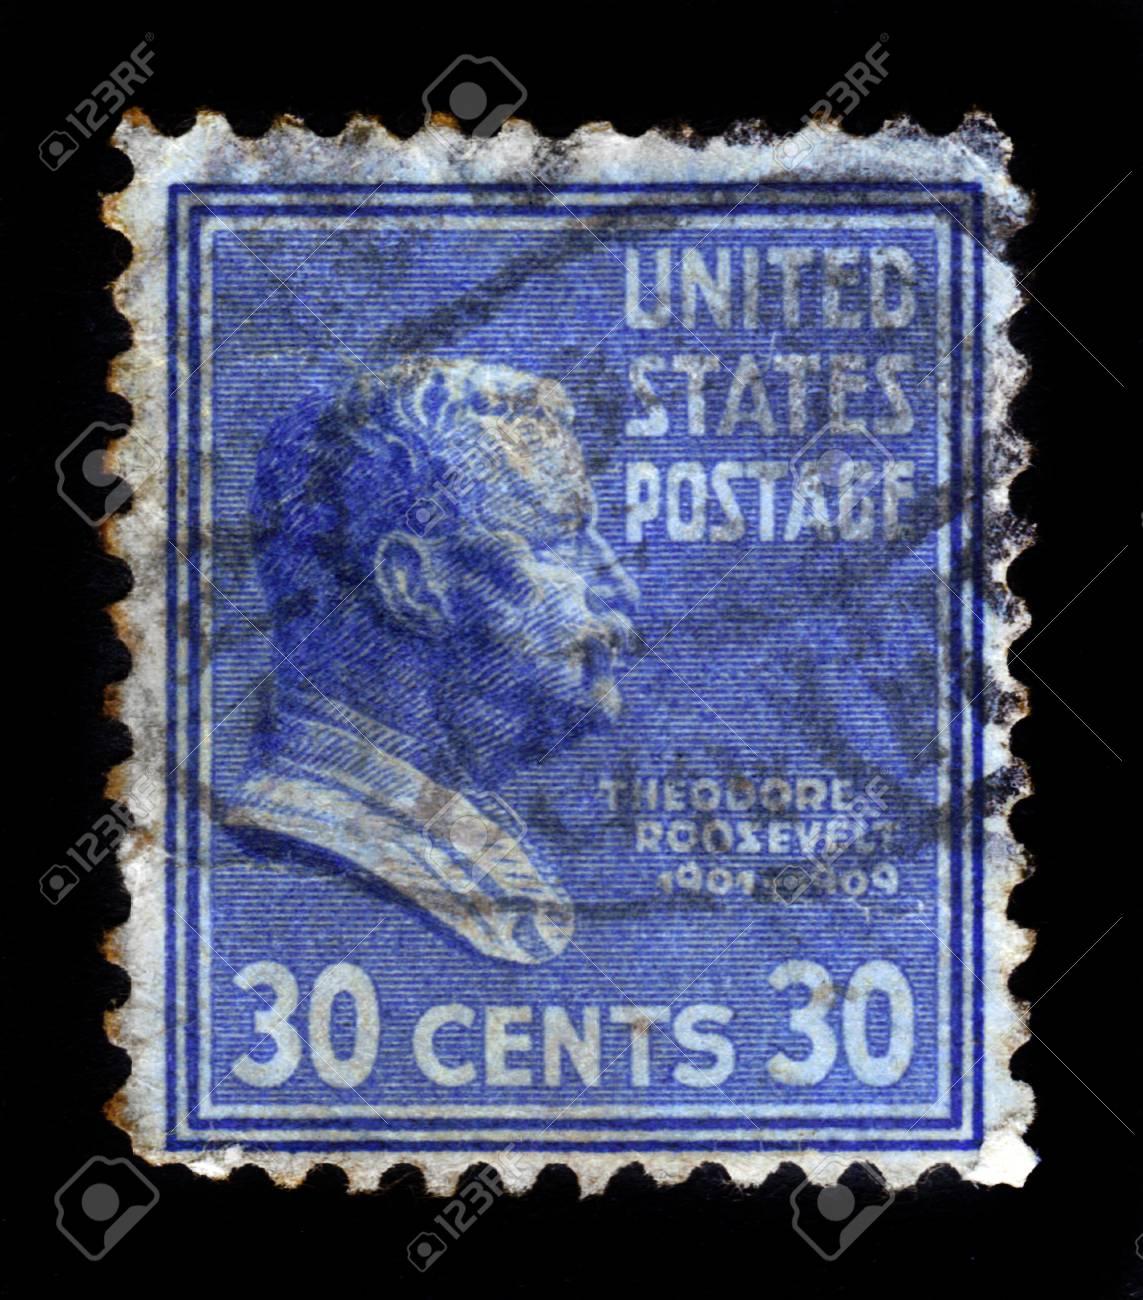 UNITED STATES OF AMERICA - CIRCA 1938  a stamp printed in the United States of America shows Theodore Roosevelt, 26th President of USA 1901-1909, circa 1938 Stock Photo - 17491272